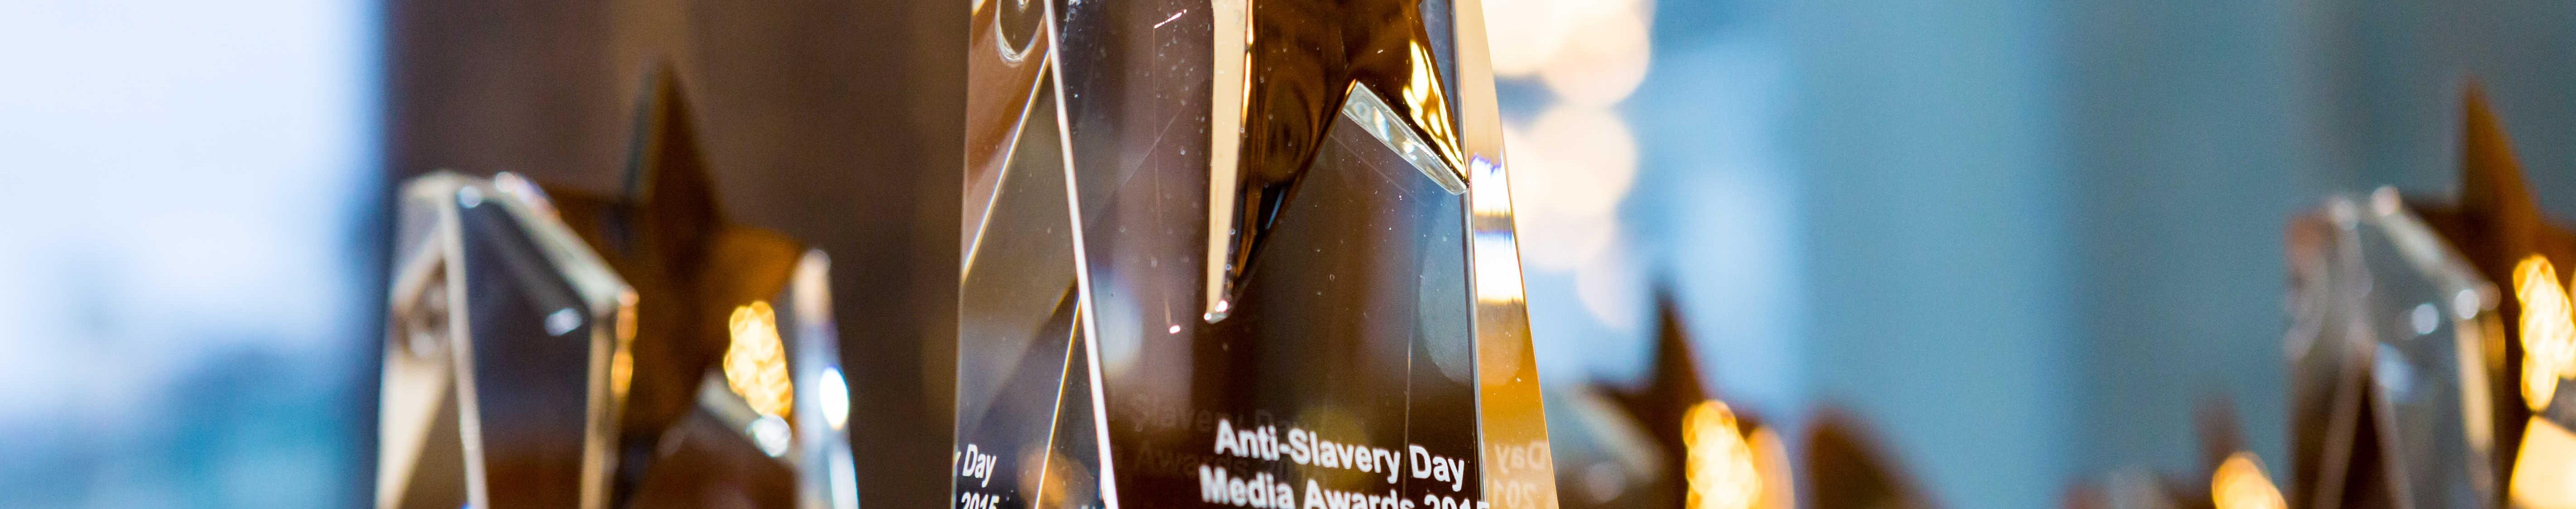 Media Award image